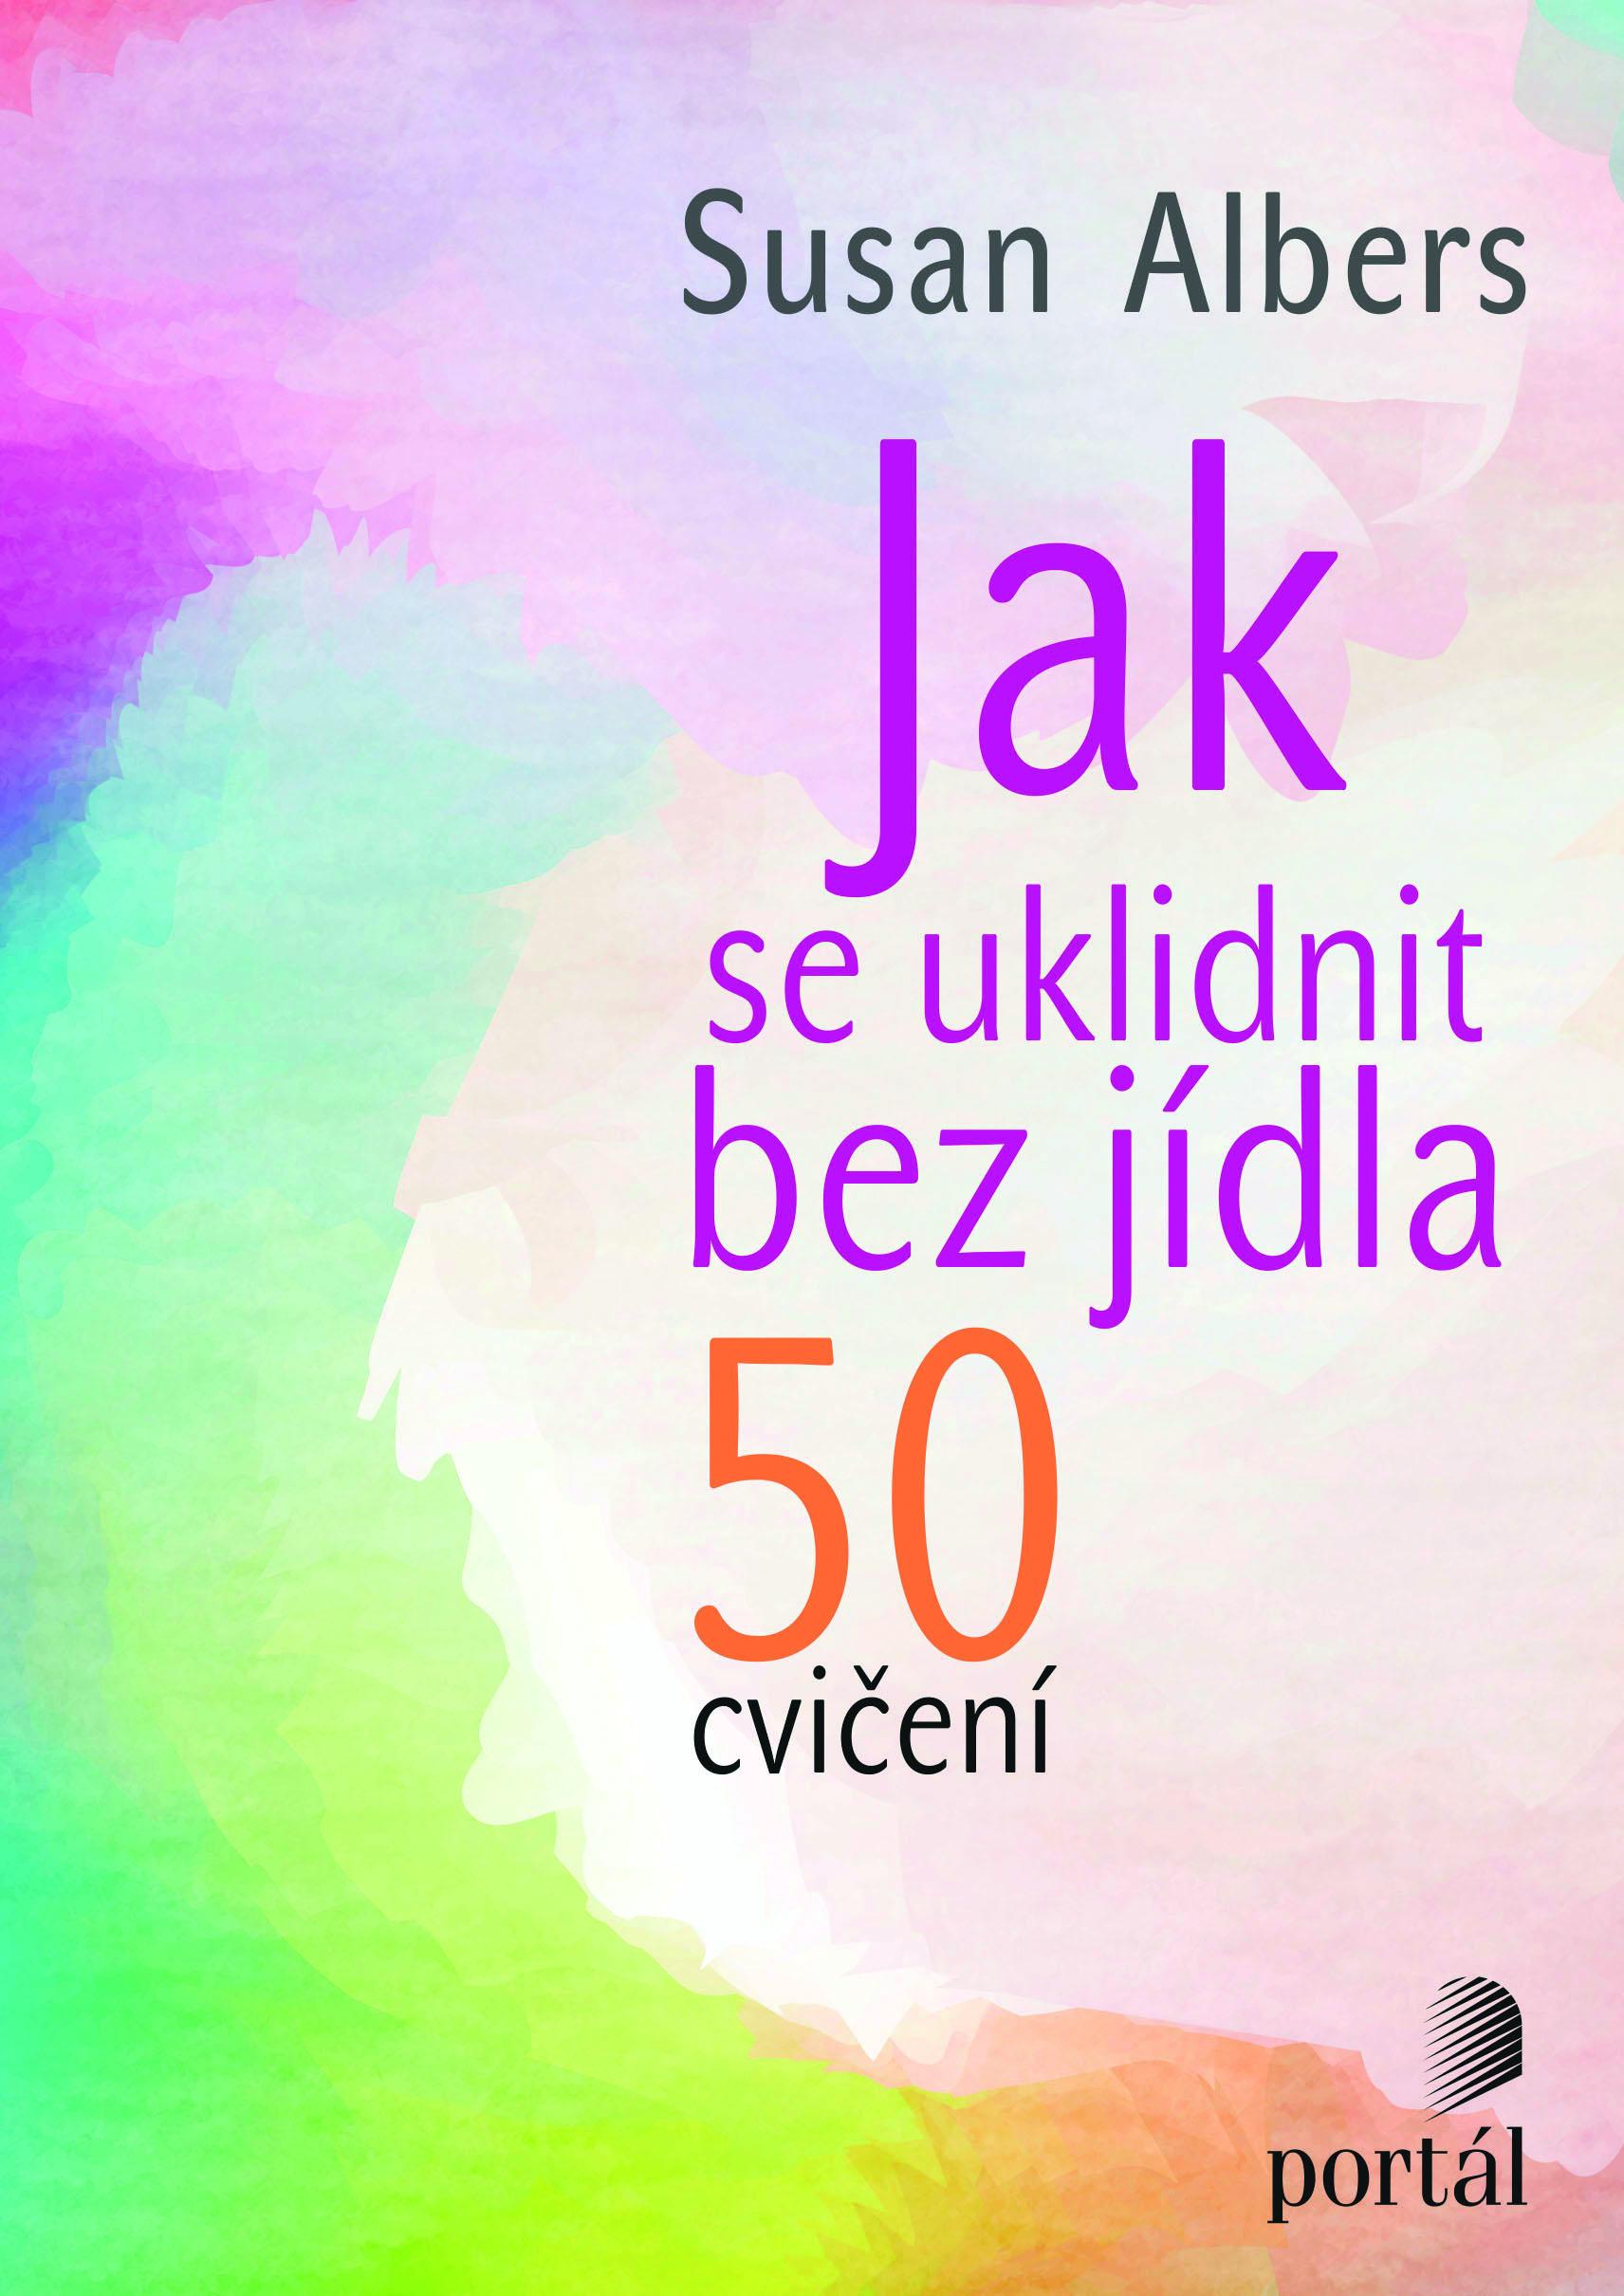 http://obchod.portal.cz/userdata/images/hires/9788026212058.jpg